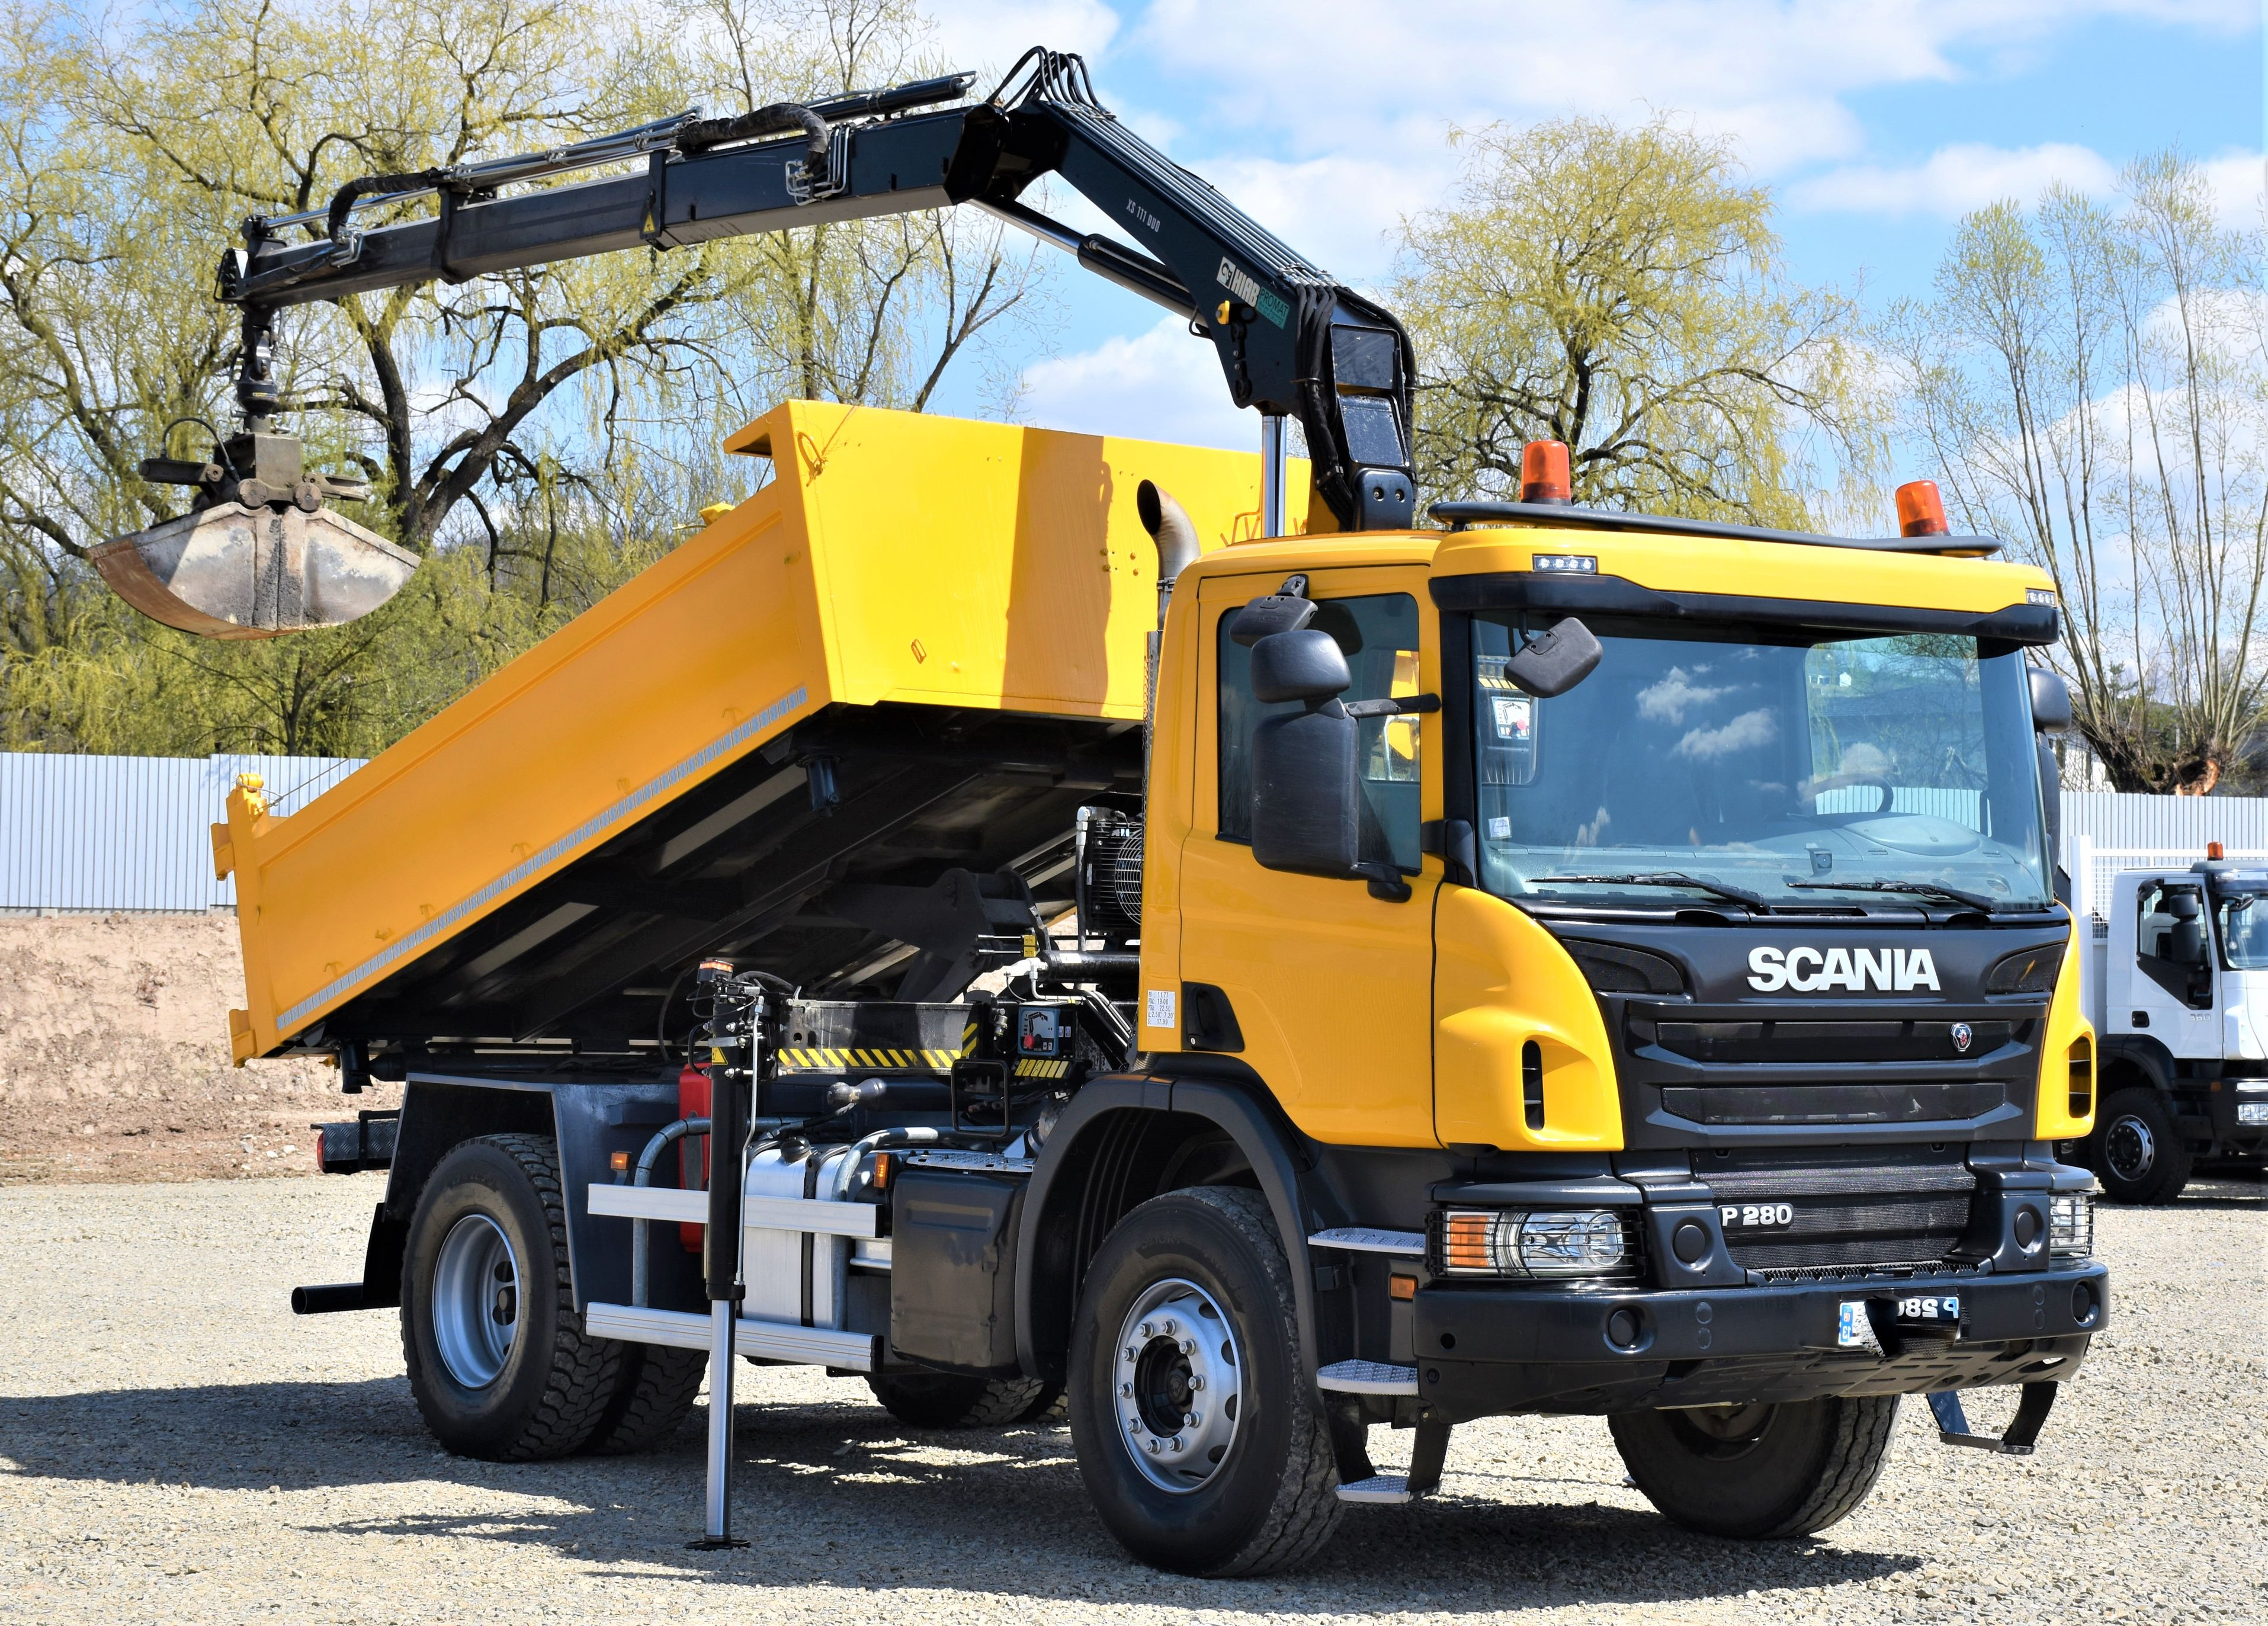 2015-scania-p280-18484501